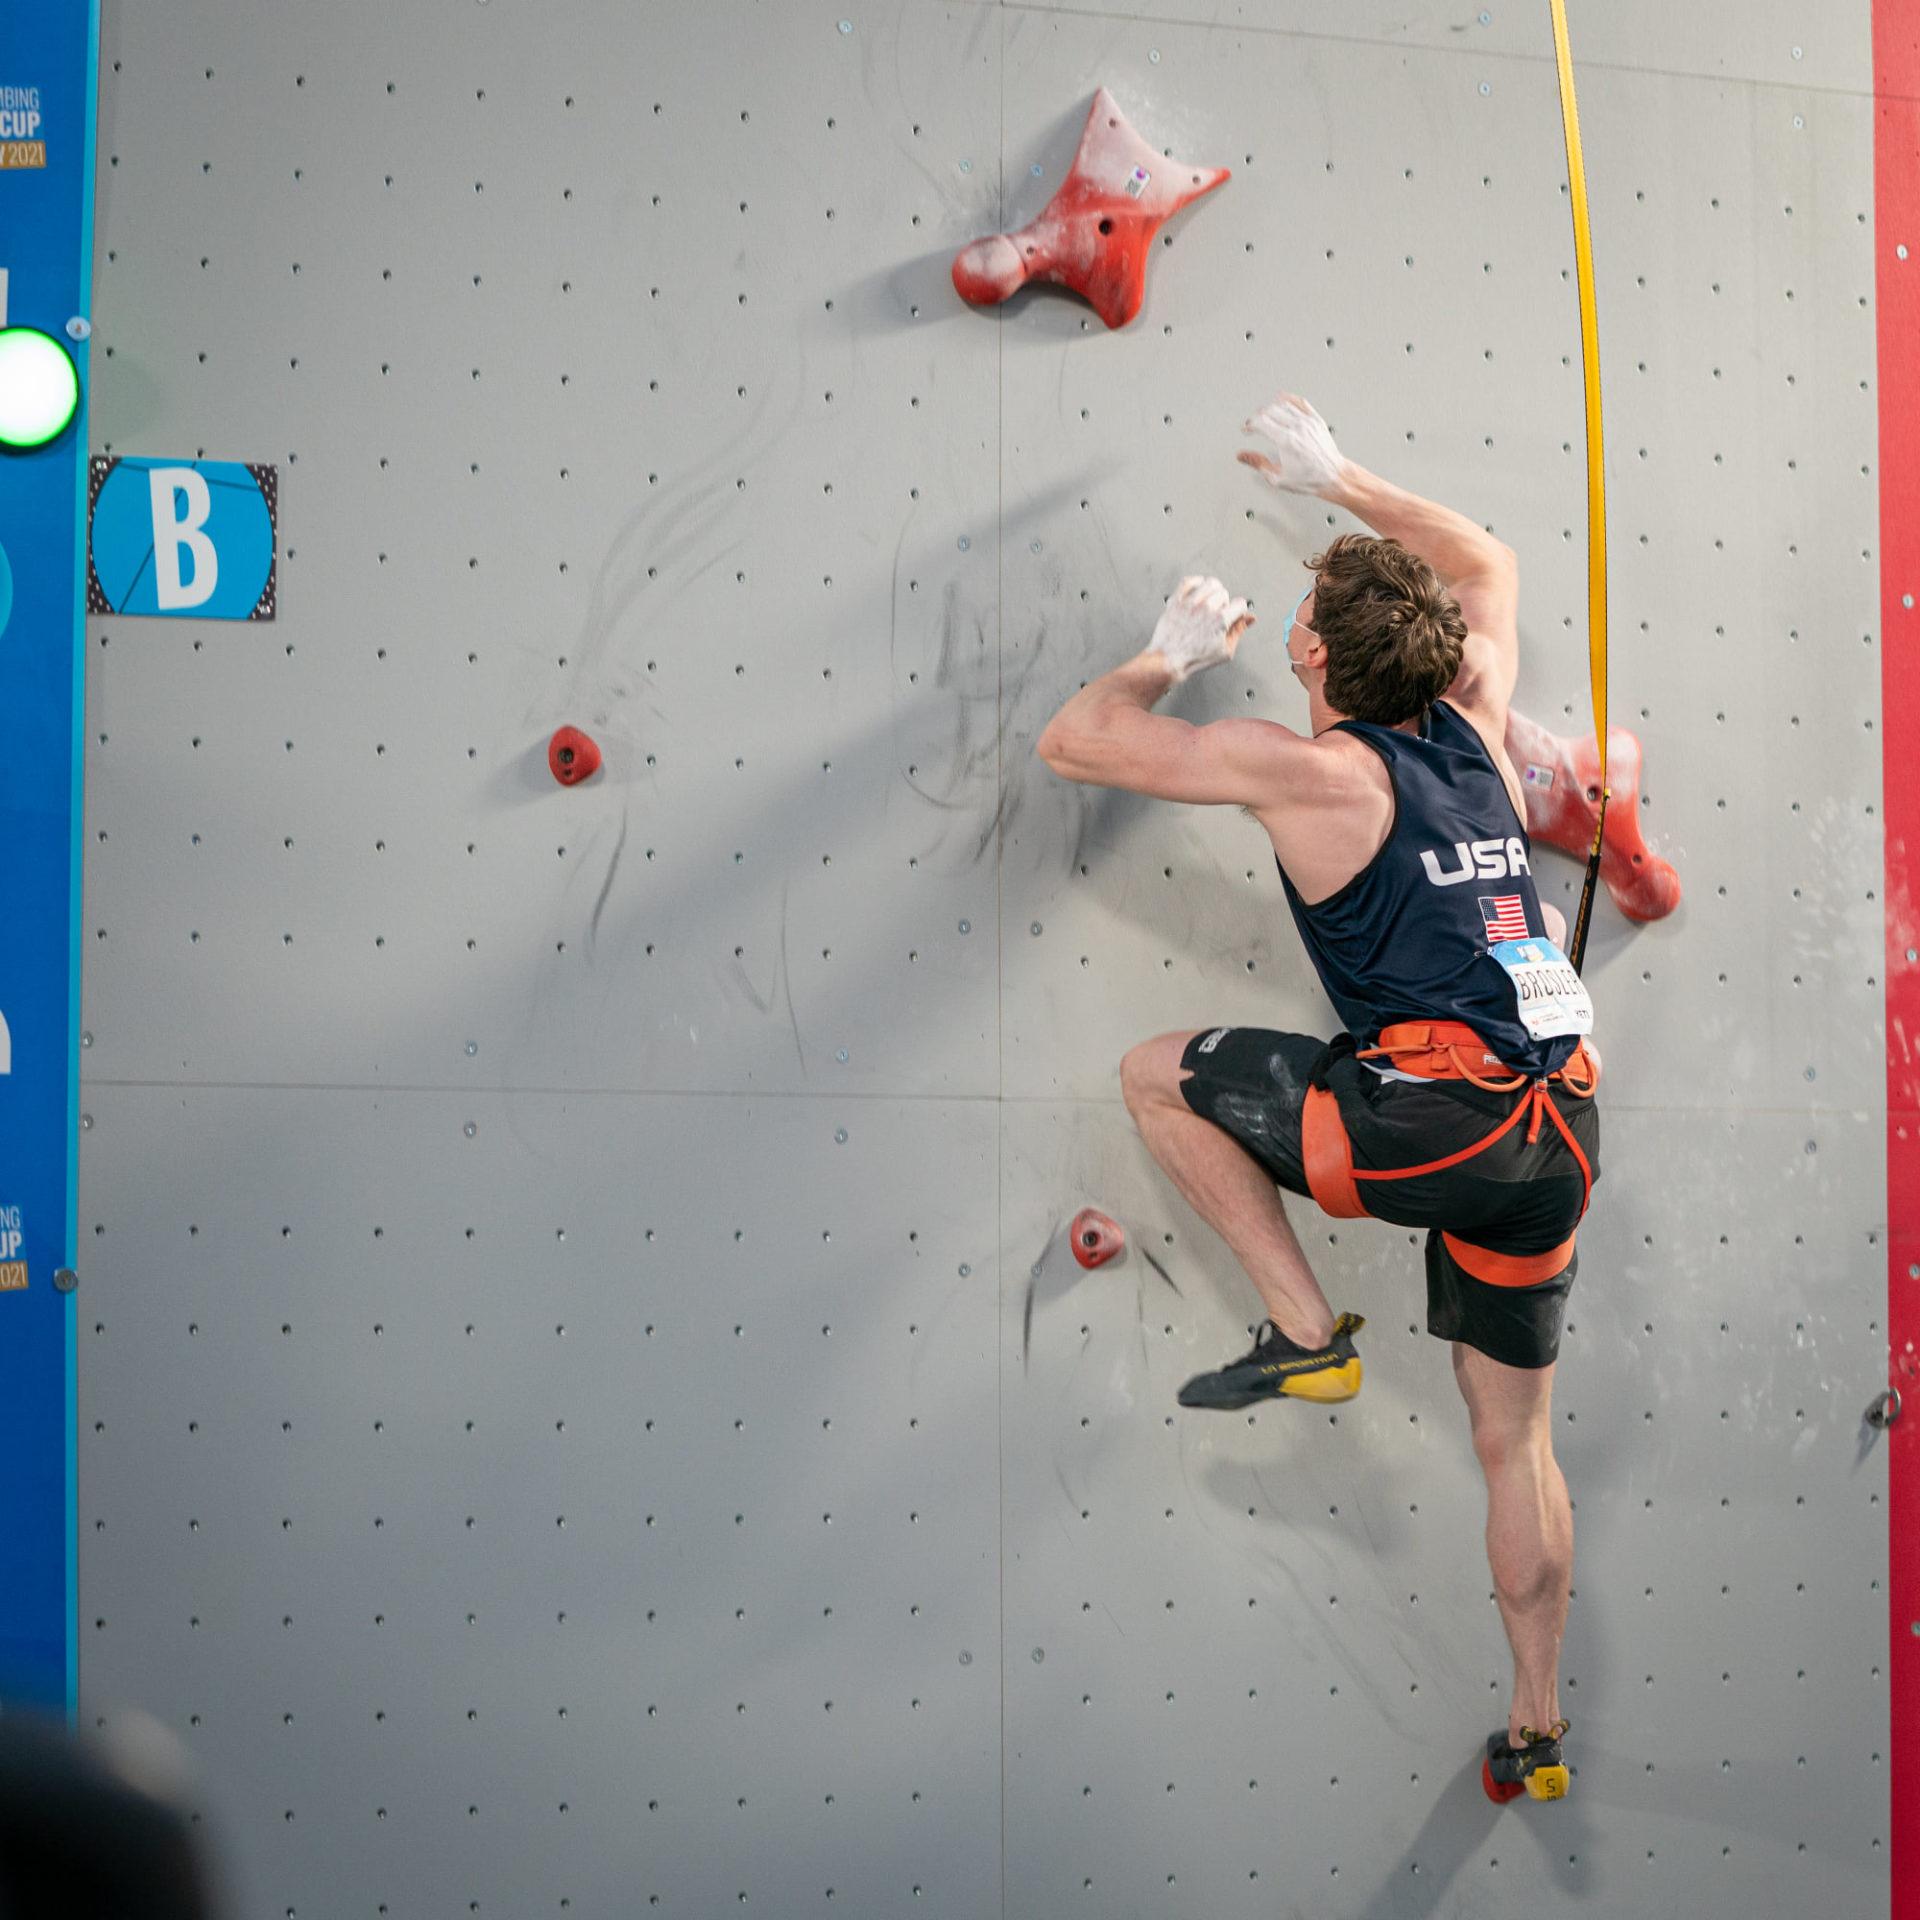 USA Male climber on climbing wall mid reach